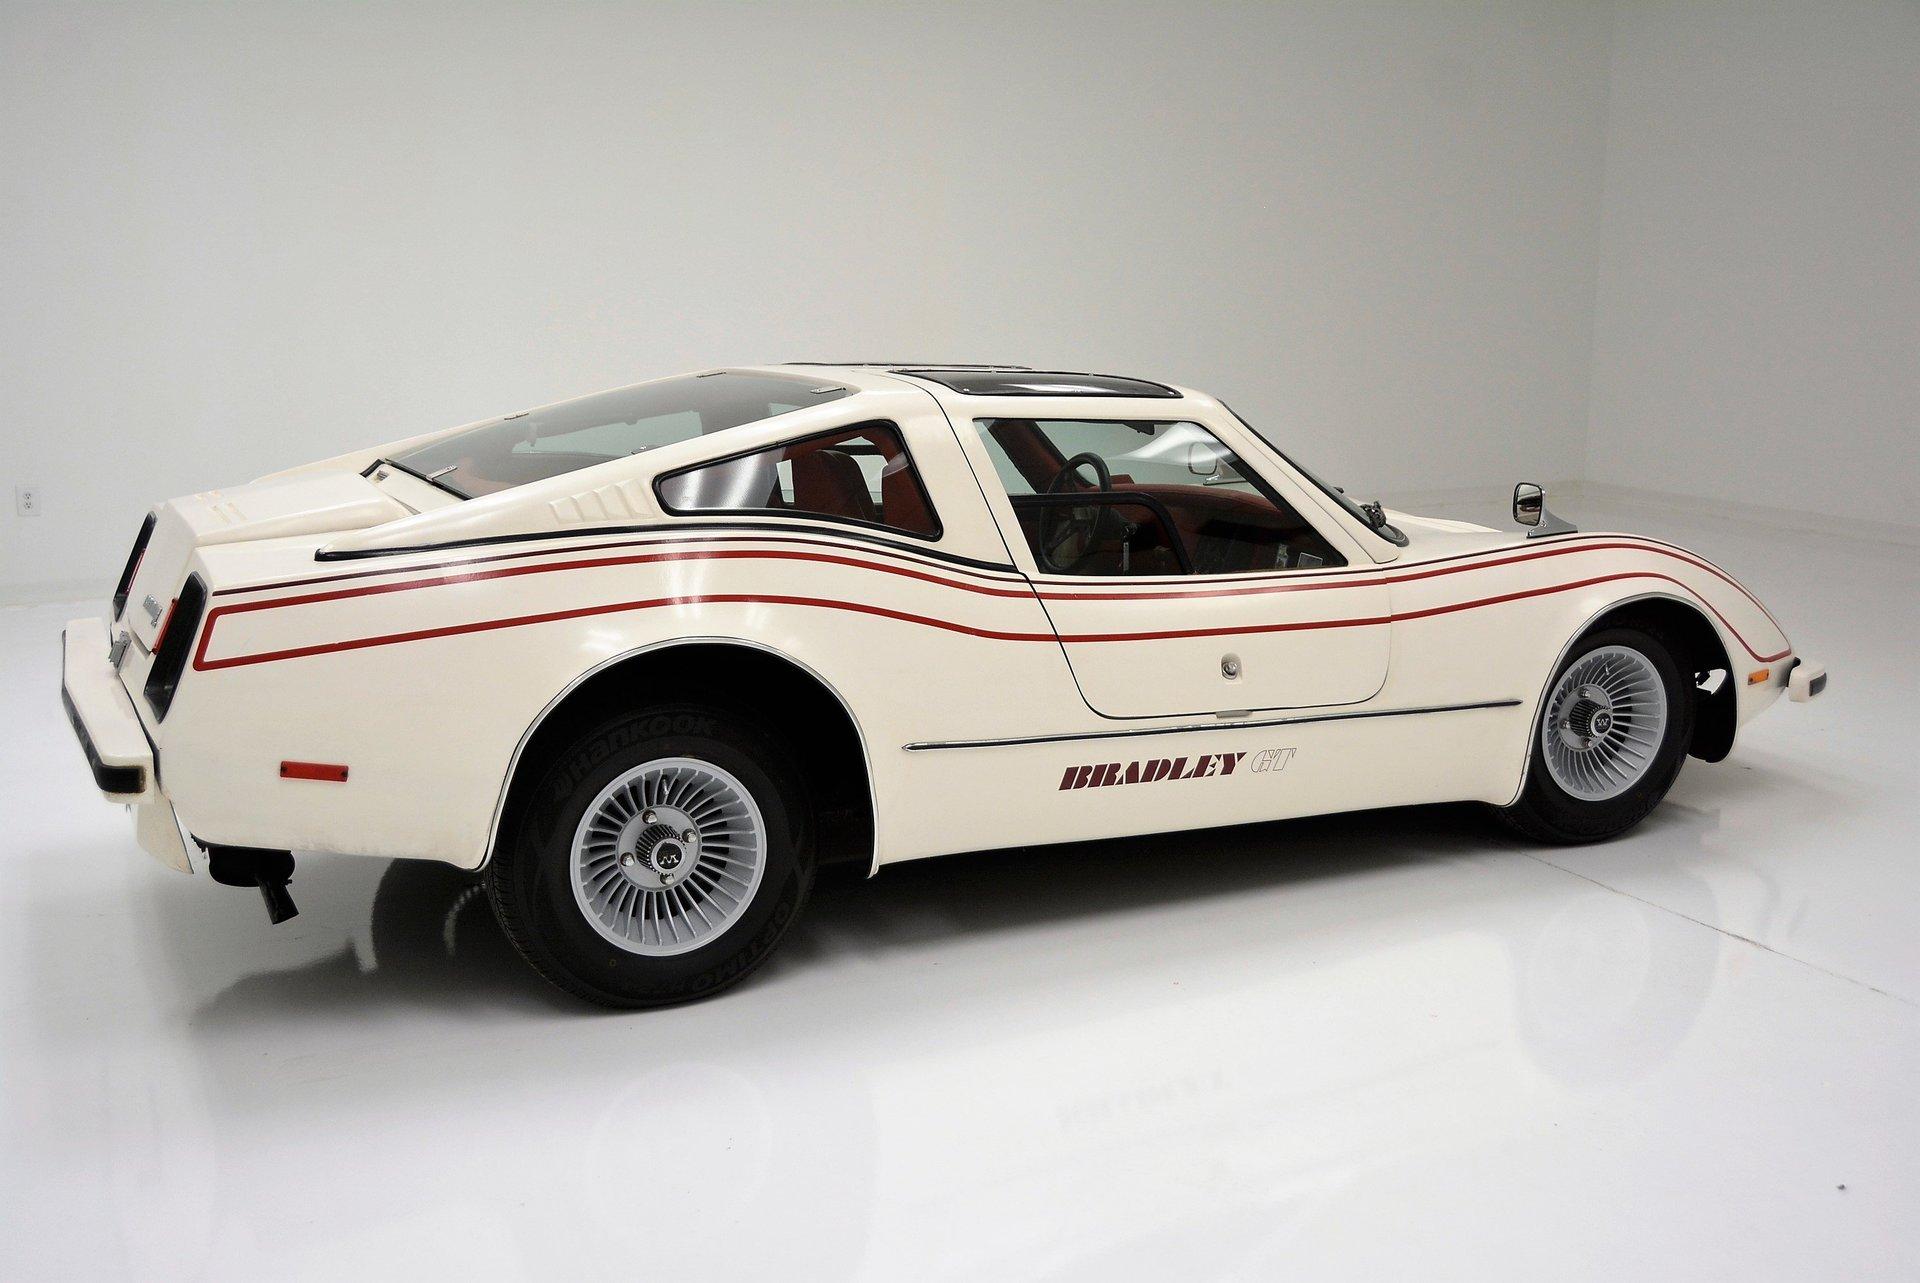 1980 Bradley Gt Classic Auto Mall